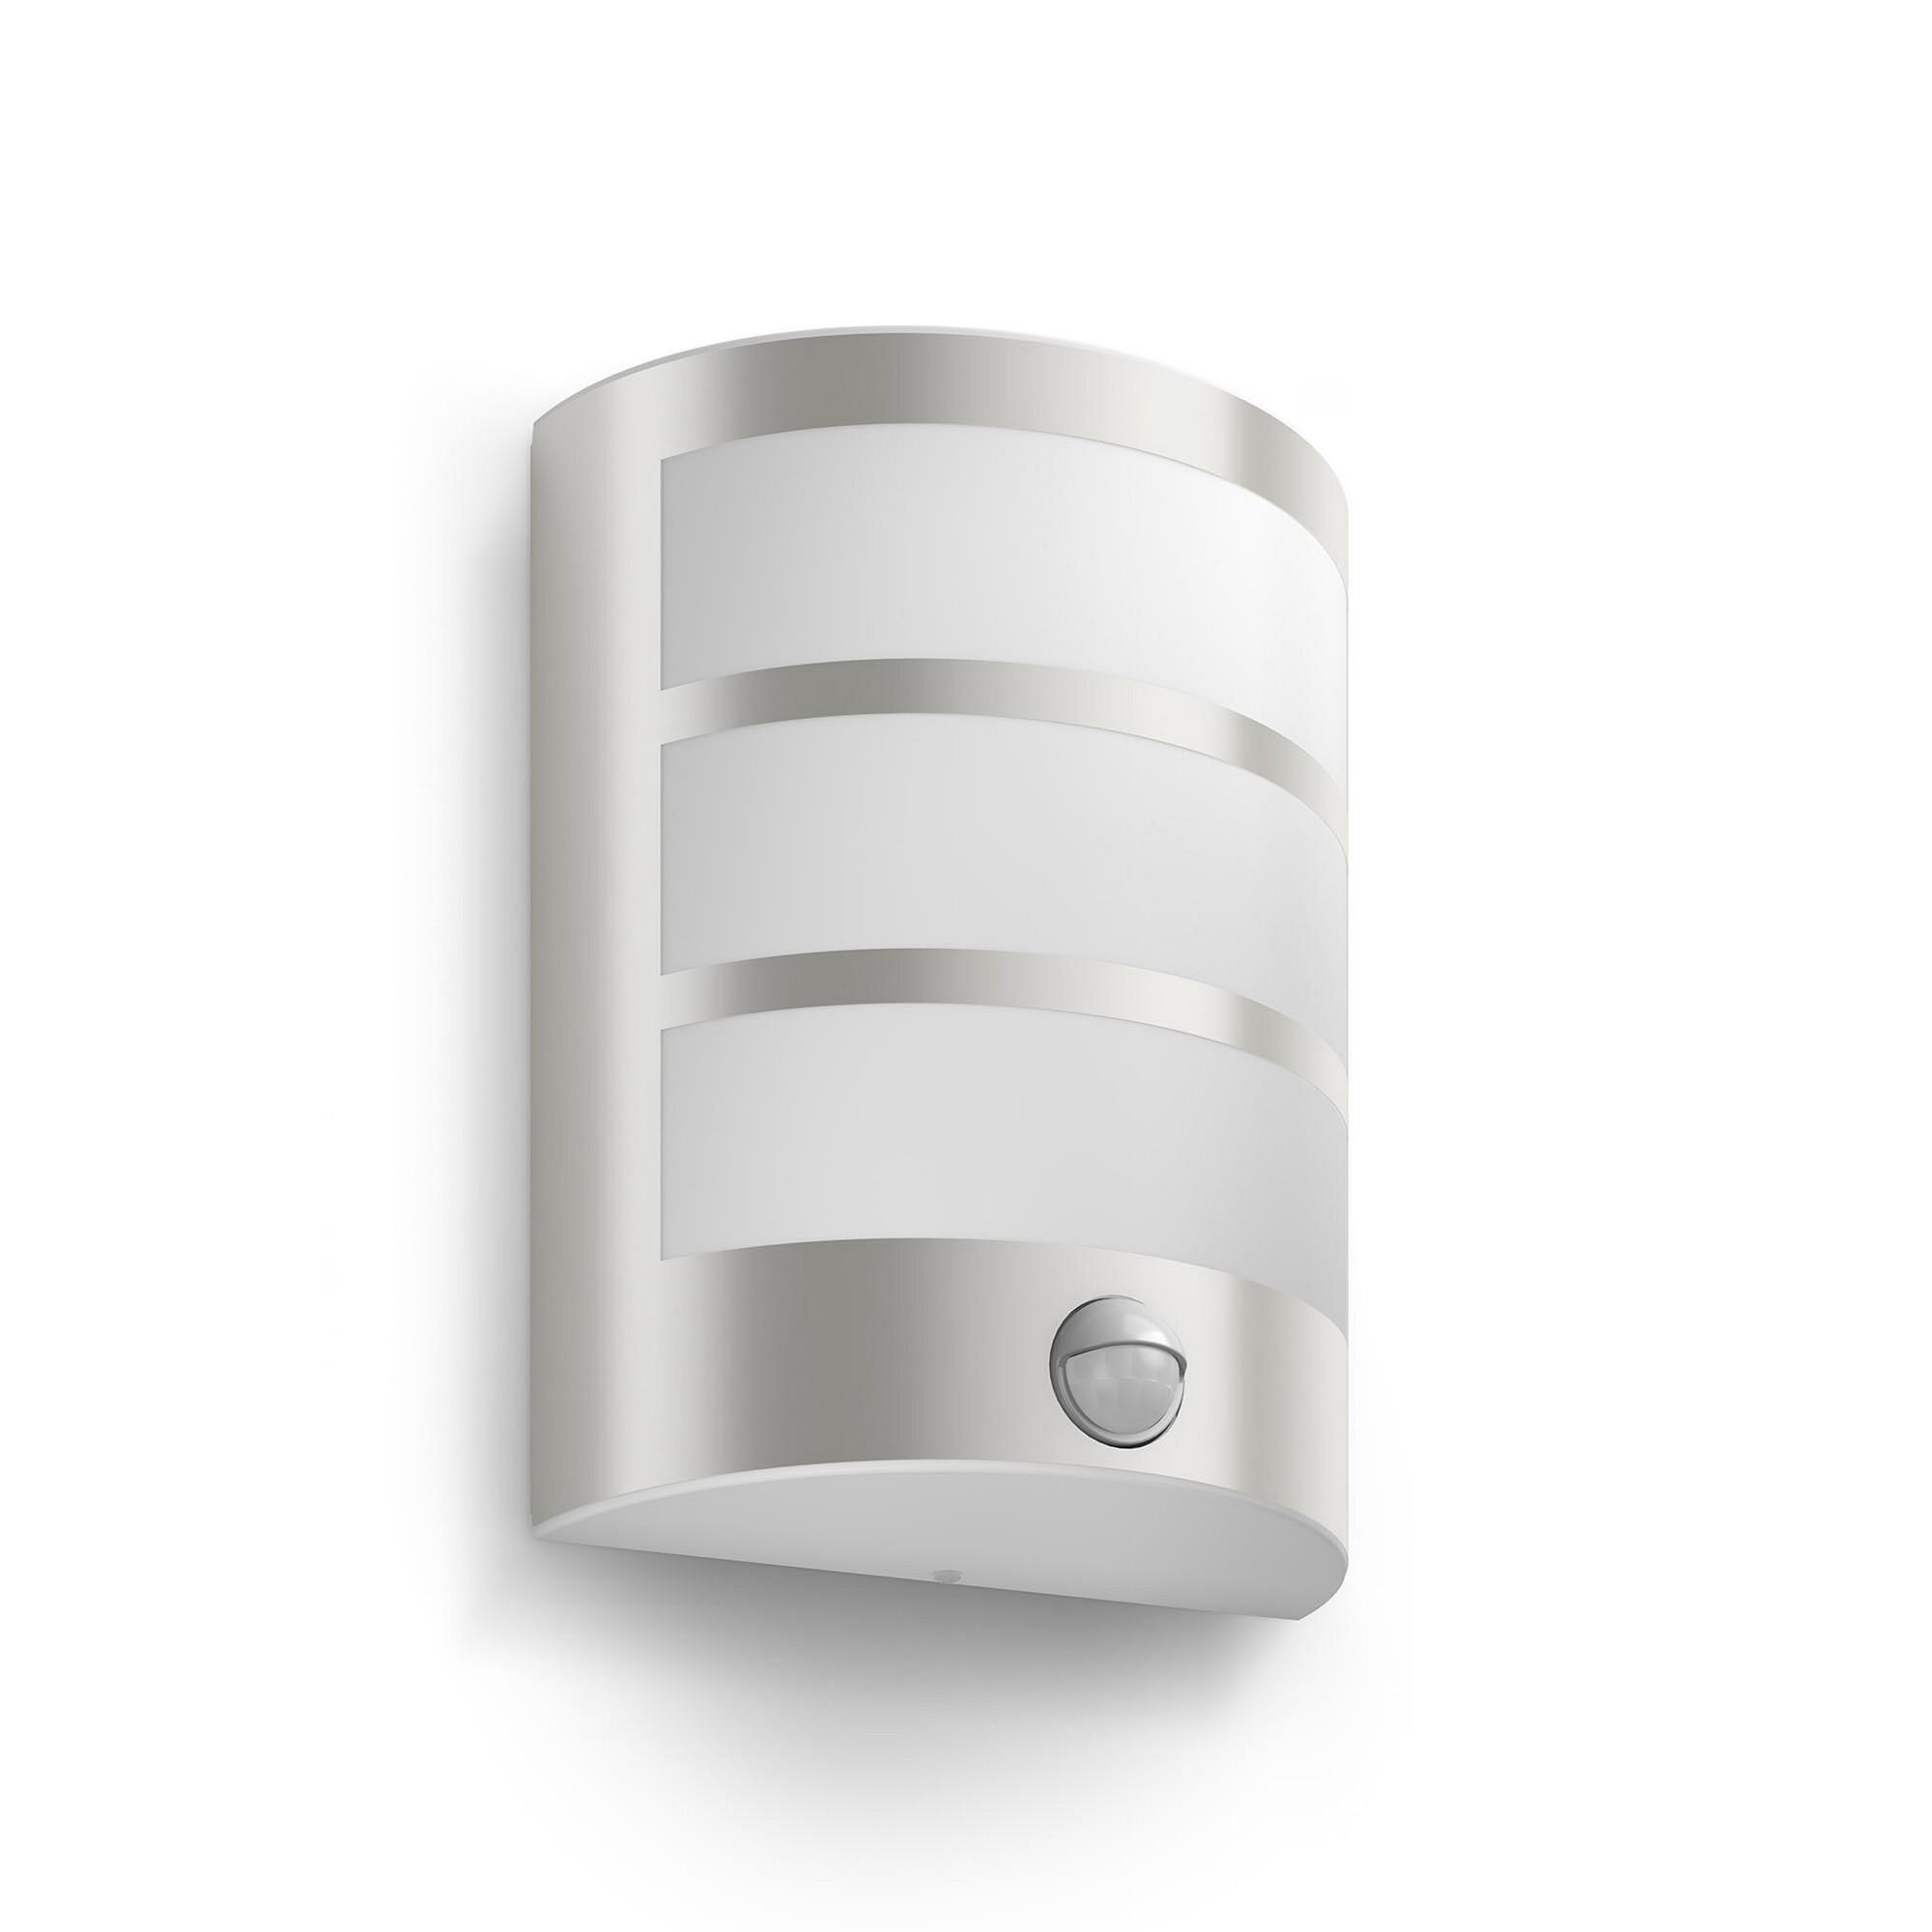 Philips PYTHON Applique LED 1x7W/600lm Anthracite